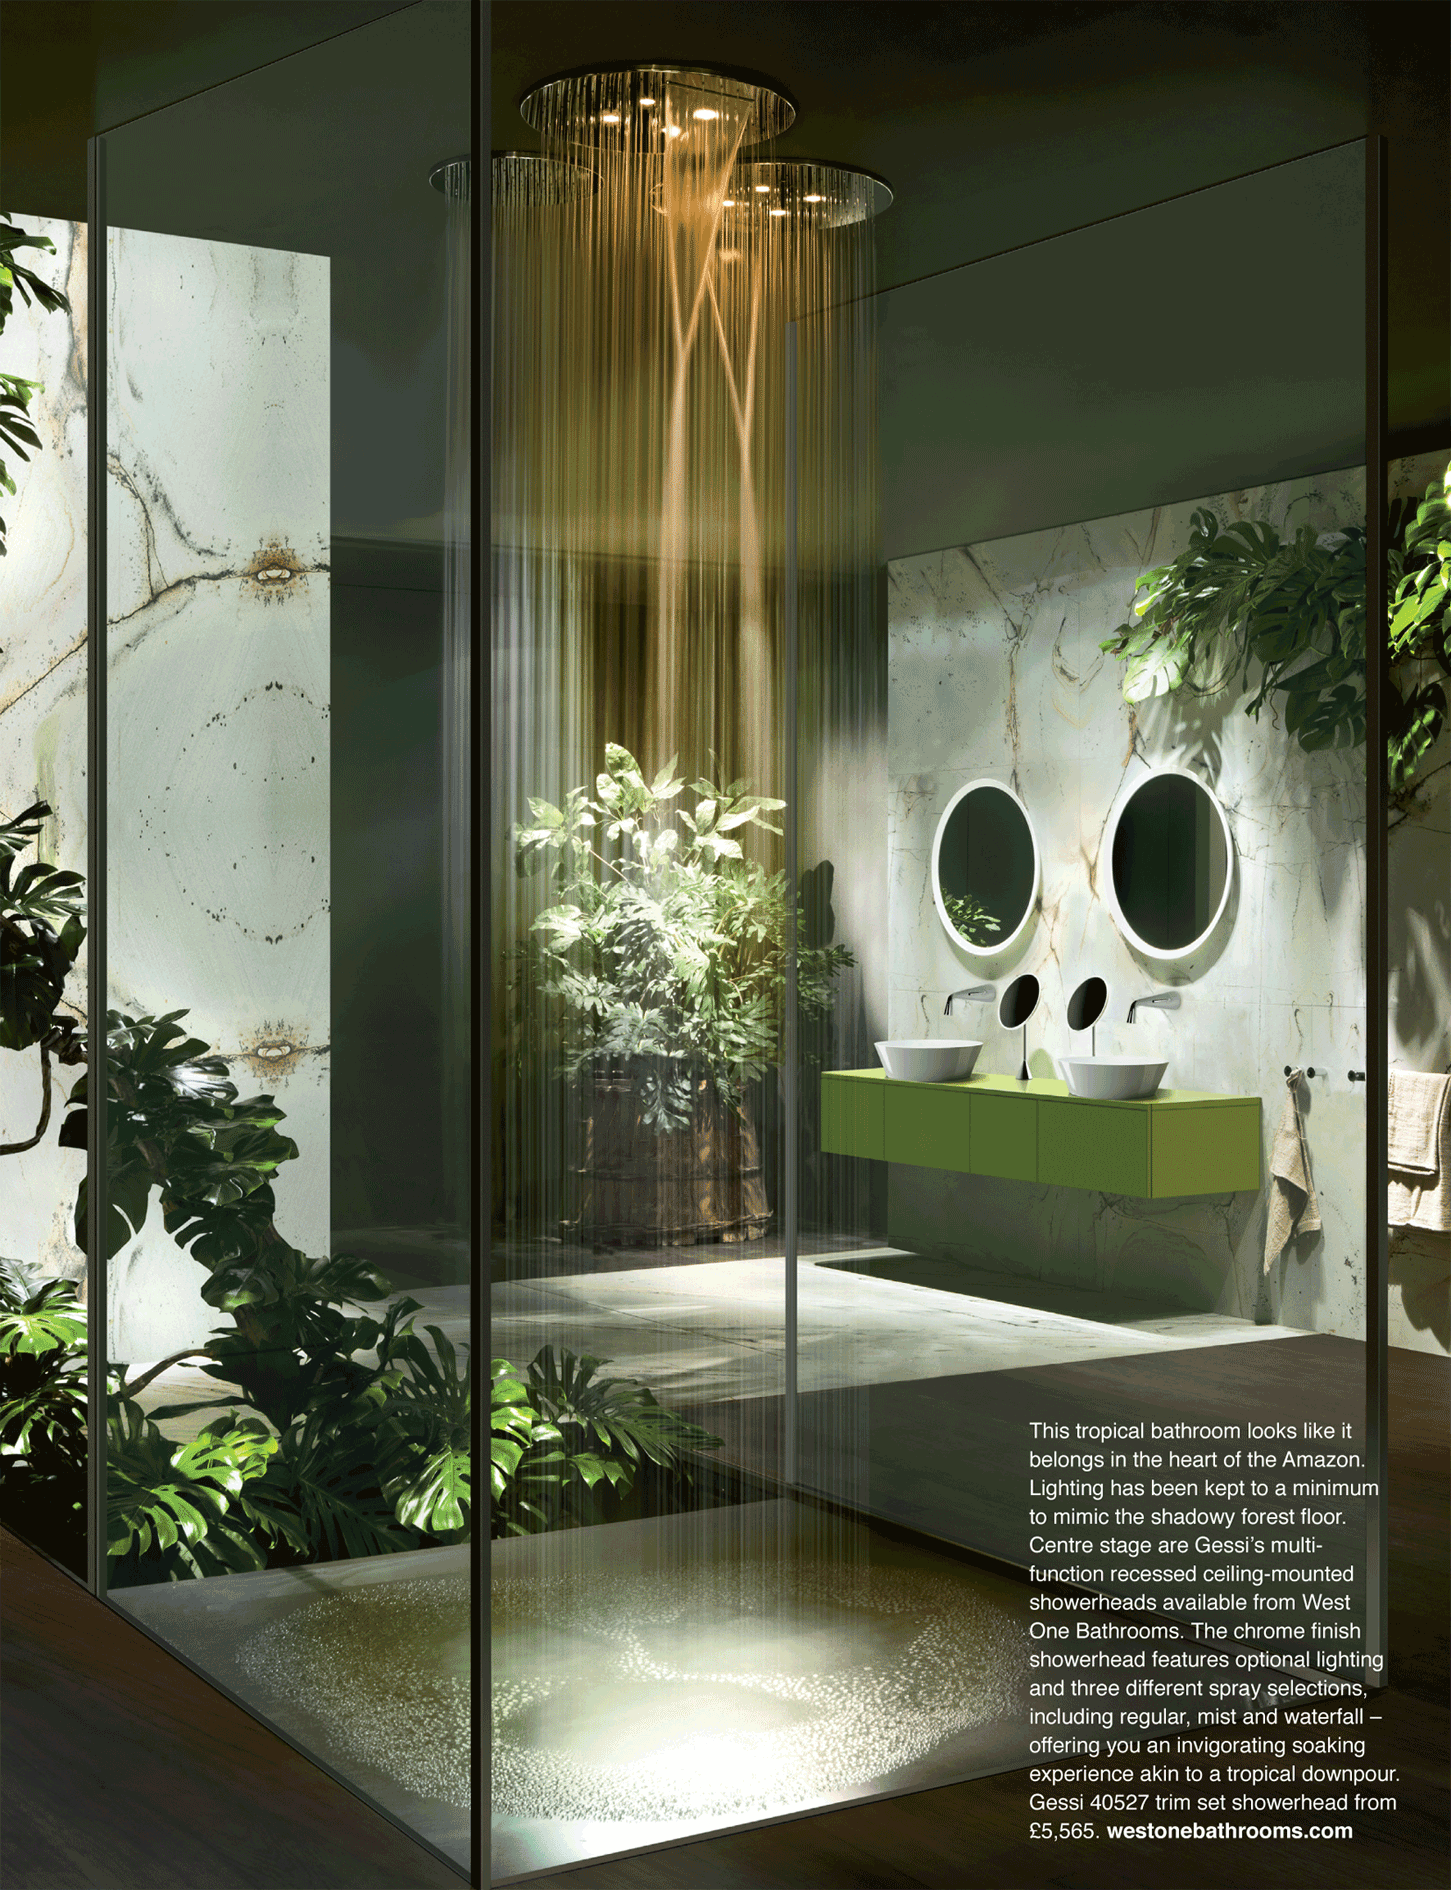 tropical bathroom lighting. The Tropical Bathroom Looks Like It Belongs In Heart Of Amazon. Lighting Has R